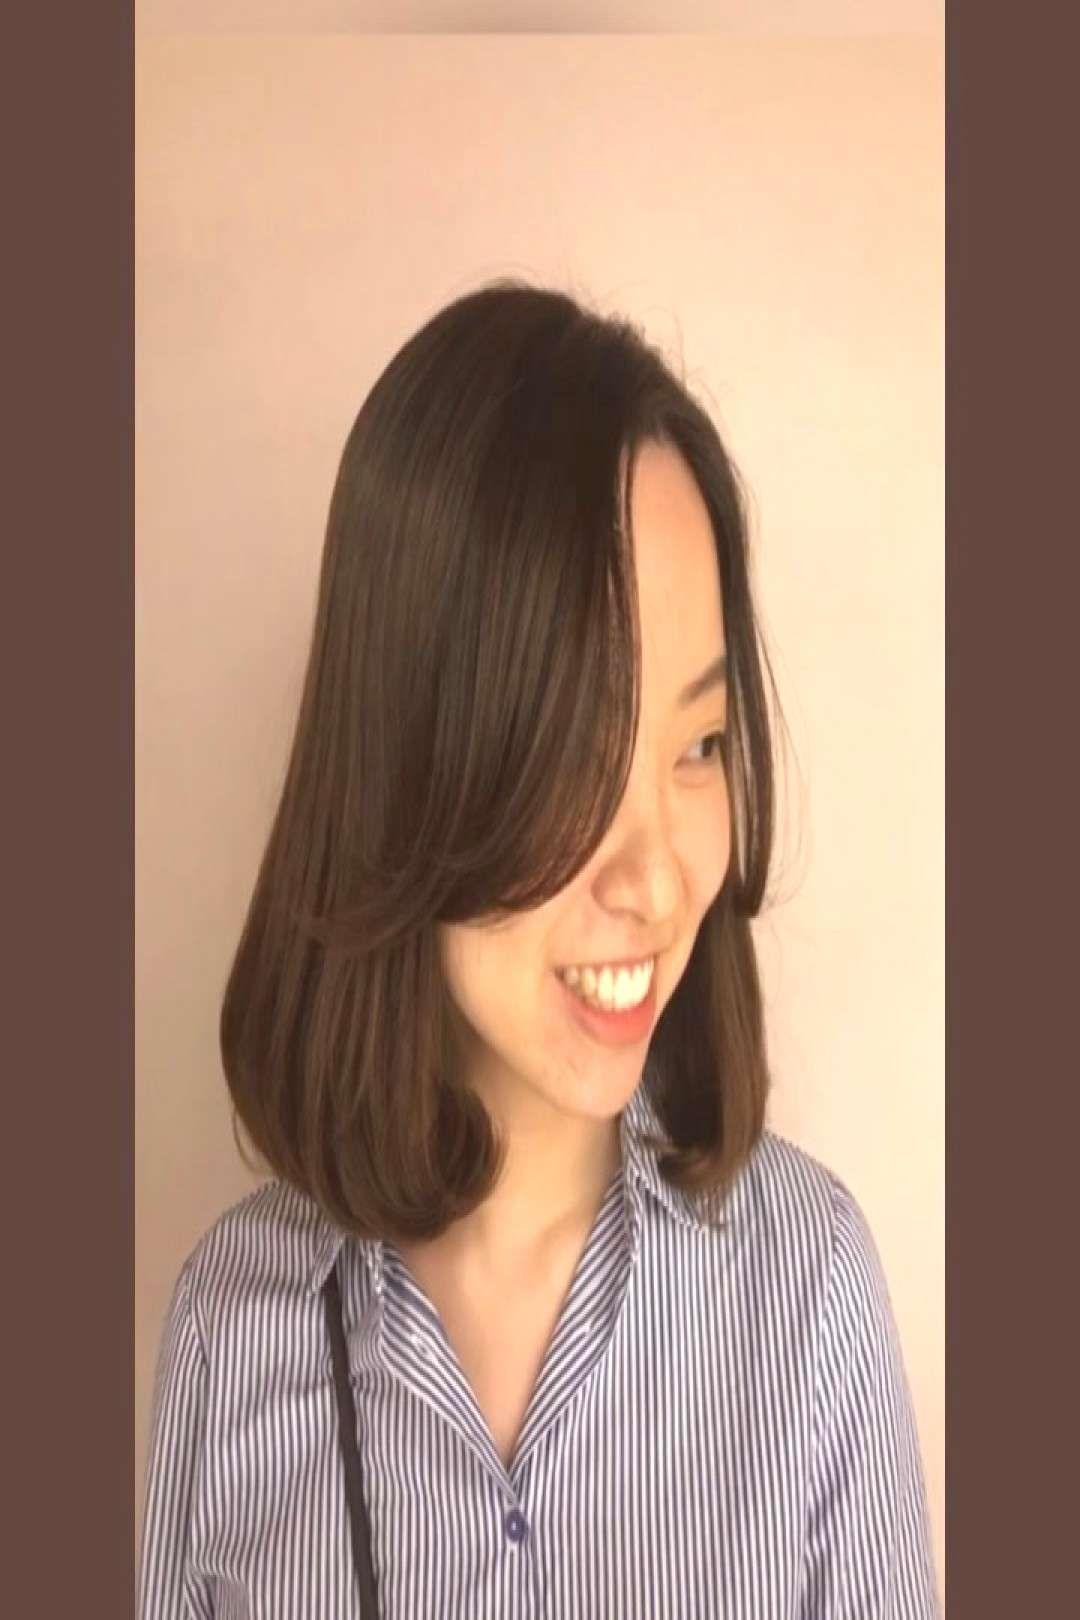 #koreanfashion #wonder #curls Wonder curlsYou can find Korean fashion and more on our website.Wonder curls